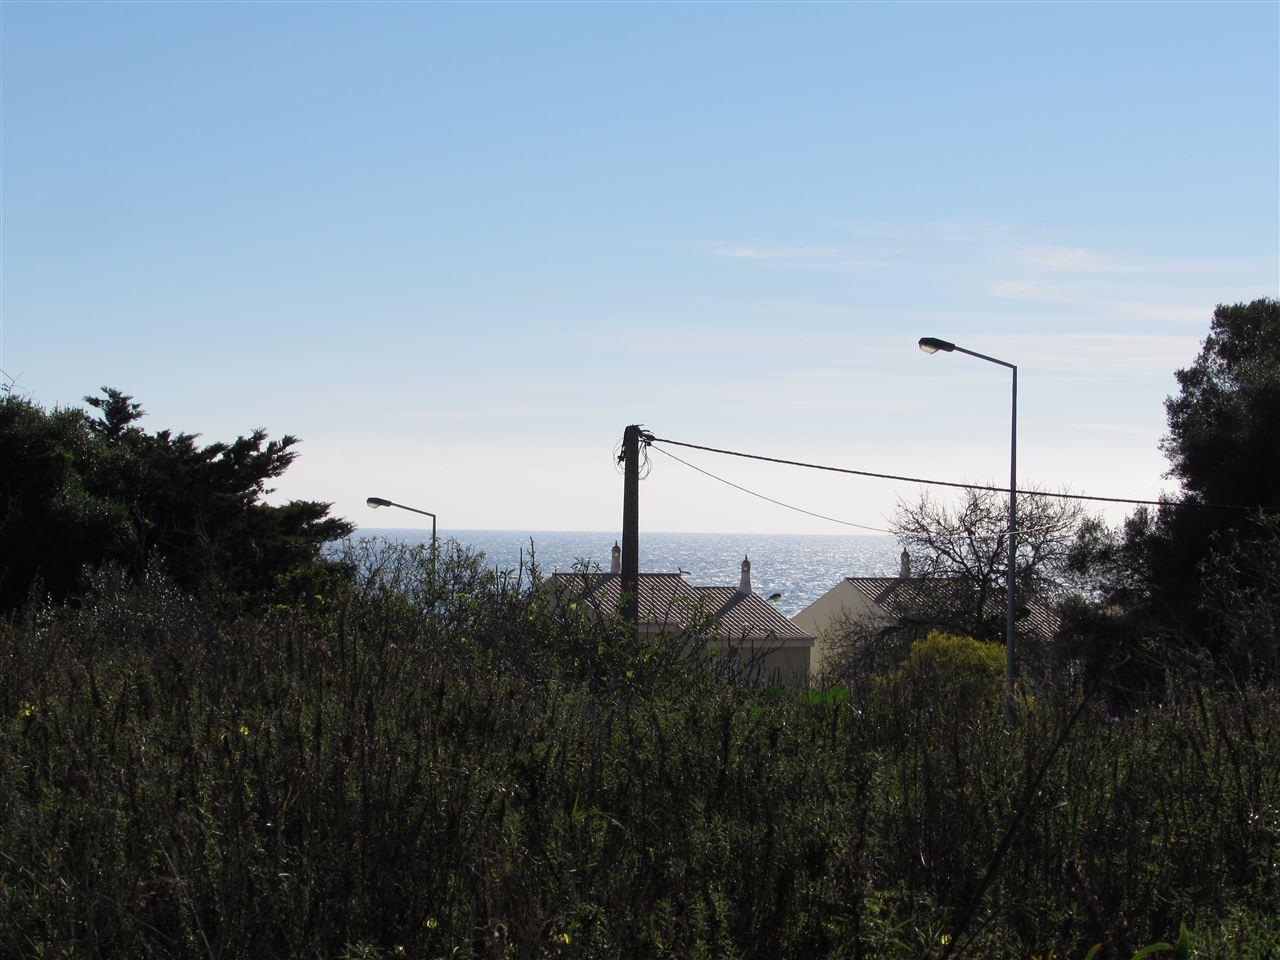 Land for Sale at Real Estate building for Sale Lagos, Algarve, 8600-184 Portugal